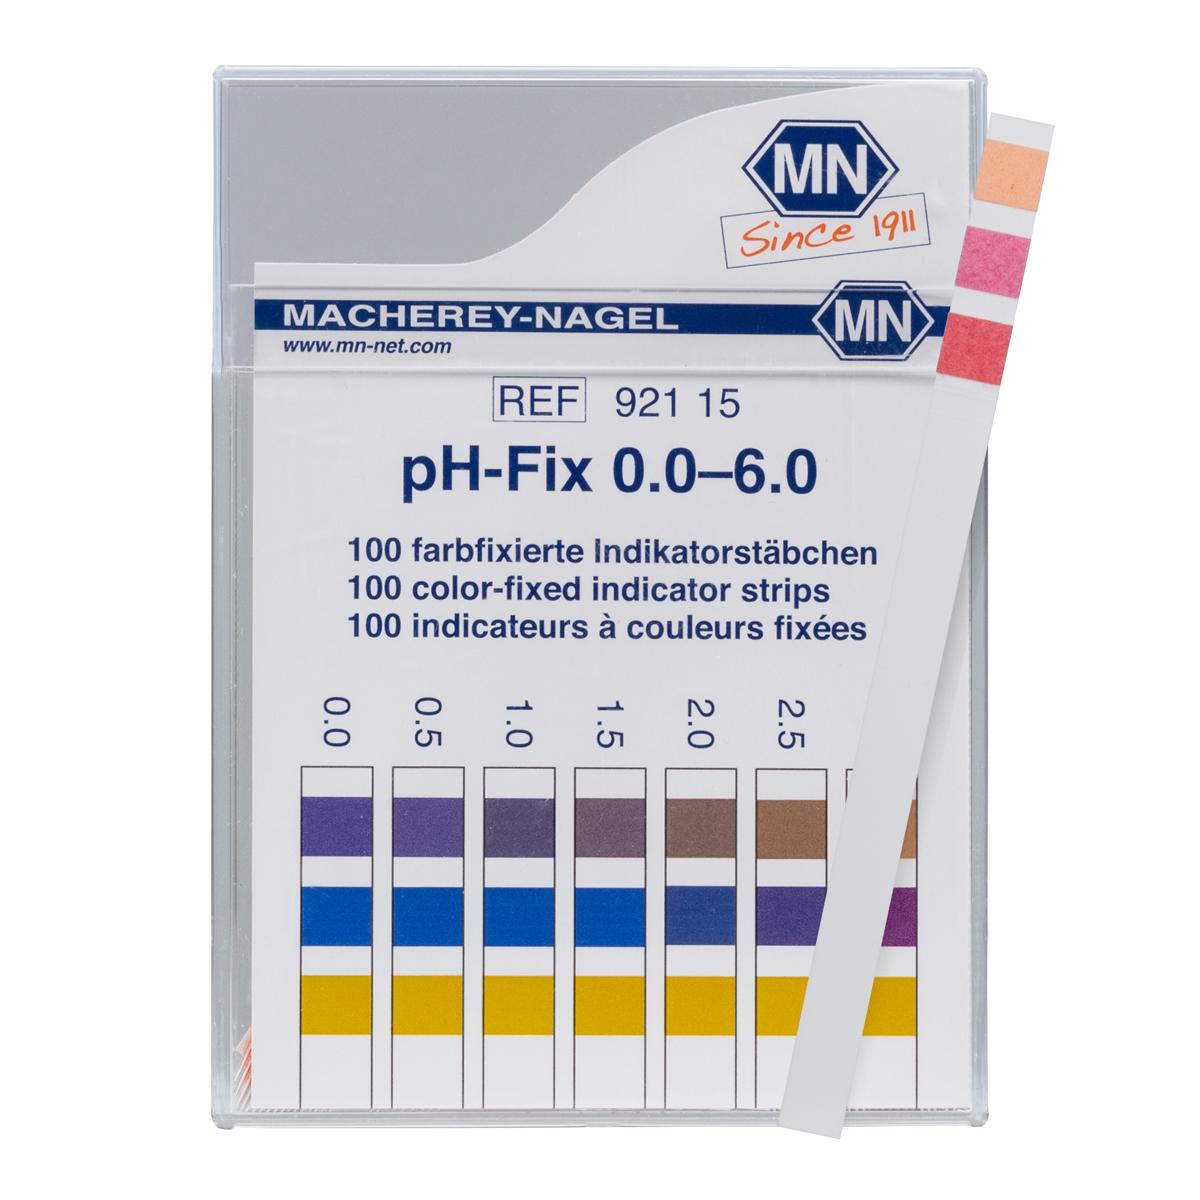 Ph indicator test sticks ph 0 6 1003795 w11724 ph ph indicator test sticks ph 0 6 nvjuhfo Images